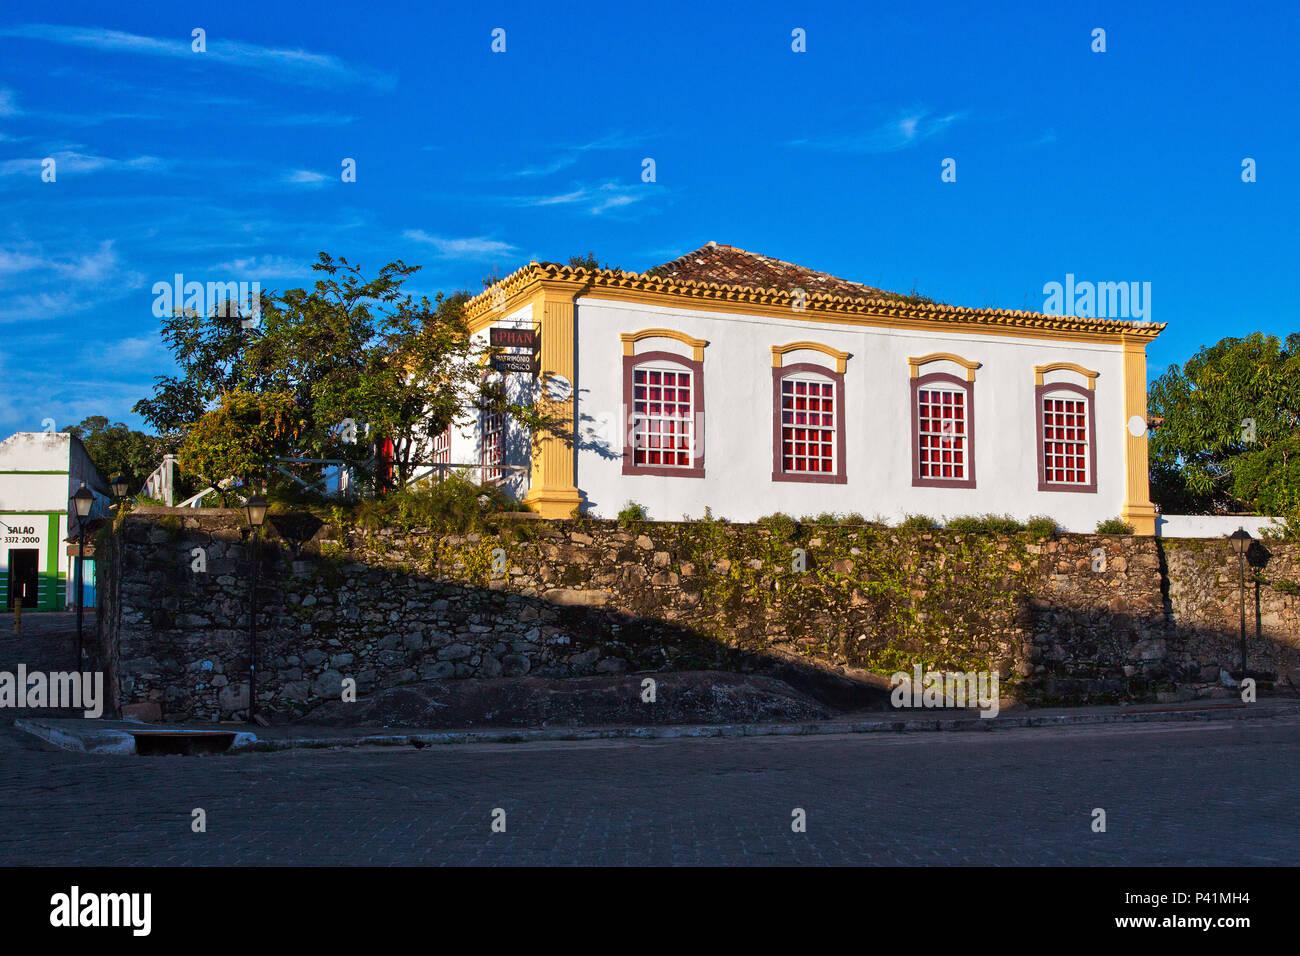 Goias-GO IPHAN Patrimônio Histórico Goiás Goiás Velho cidade histórica Centro Oeste Brasil - Stock Image